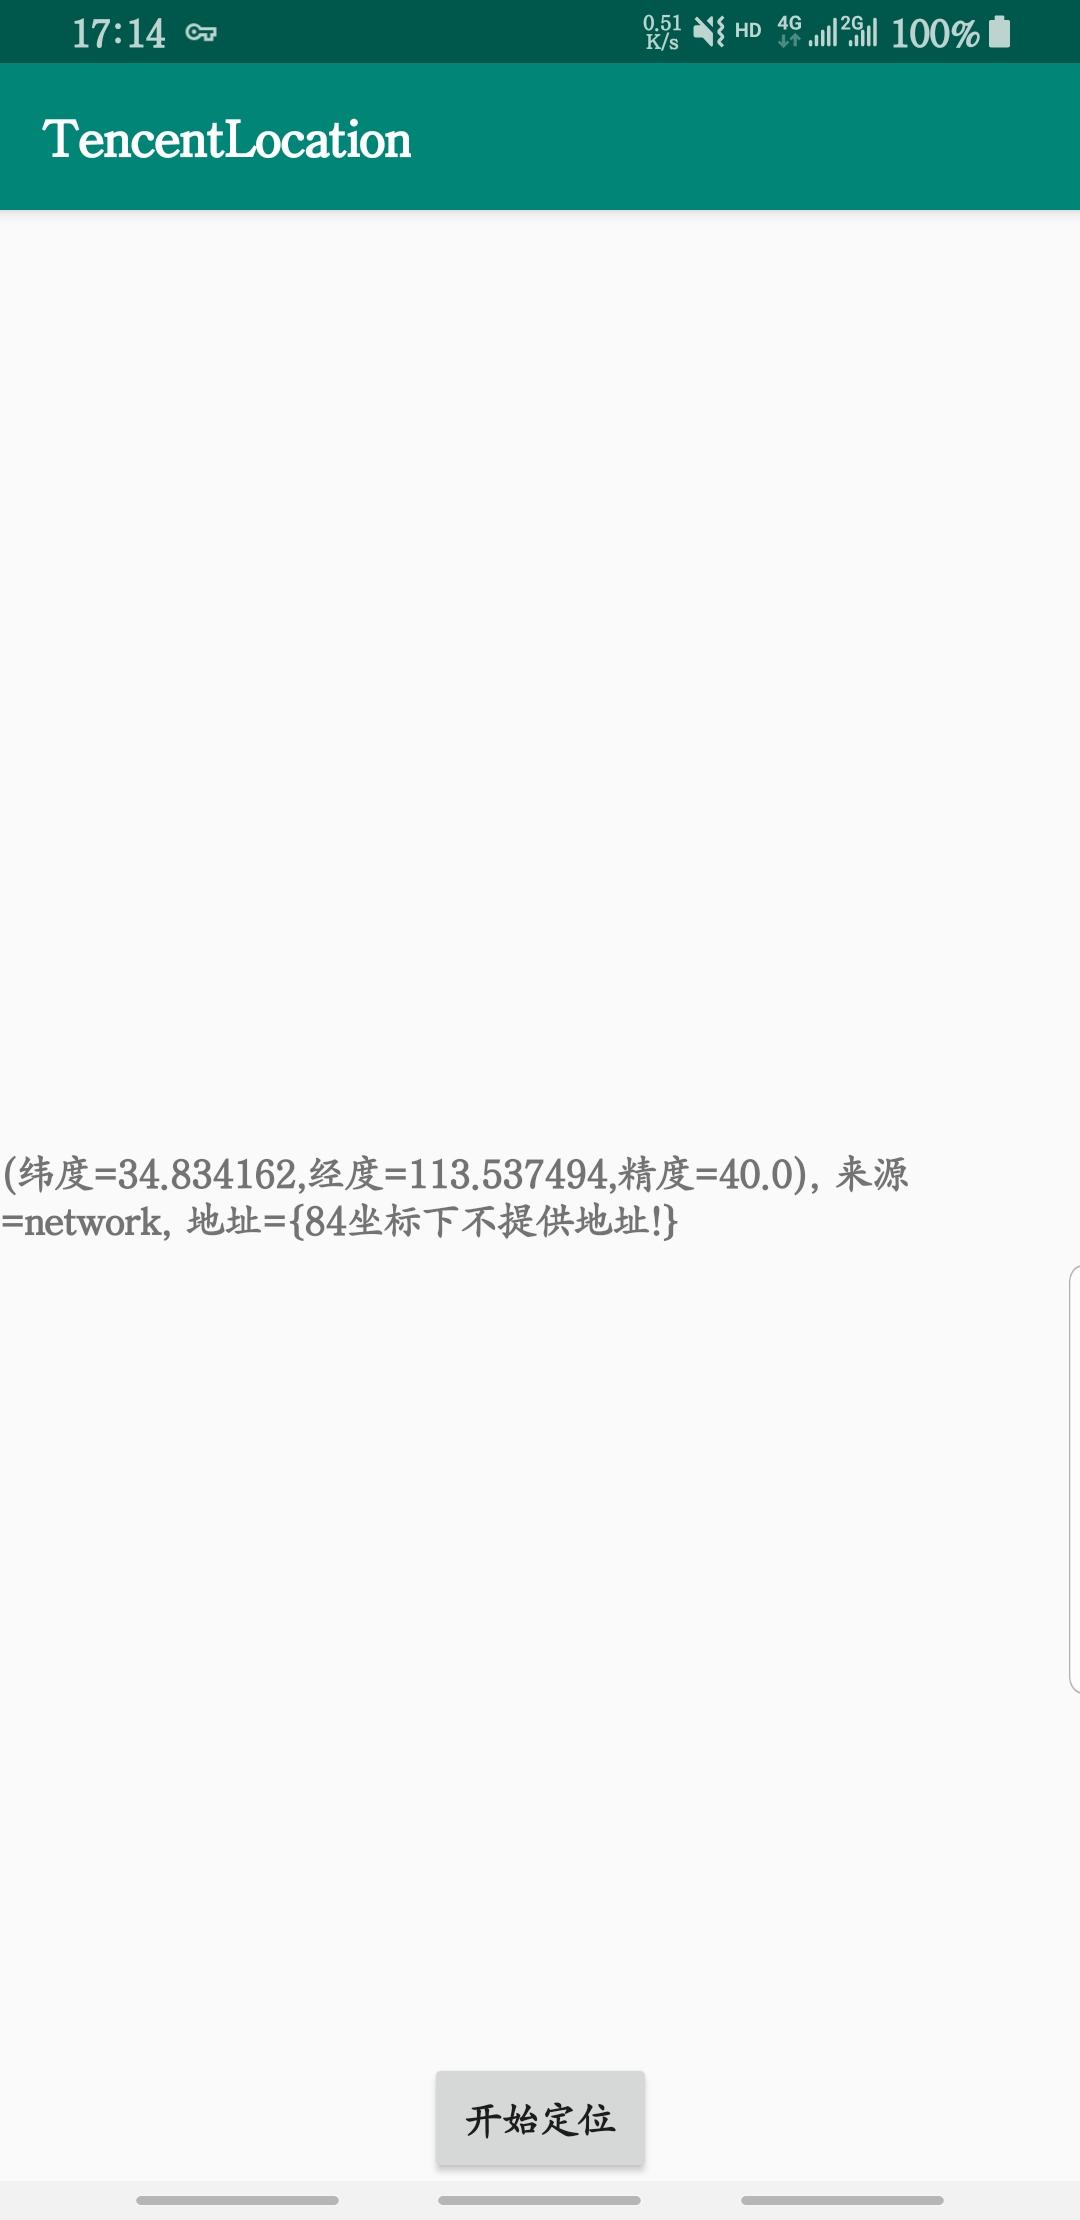 Screenshot_20190519-171420_TencentLocation.jpg